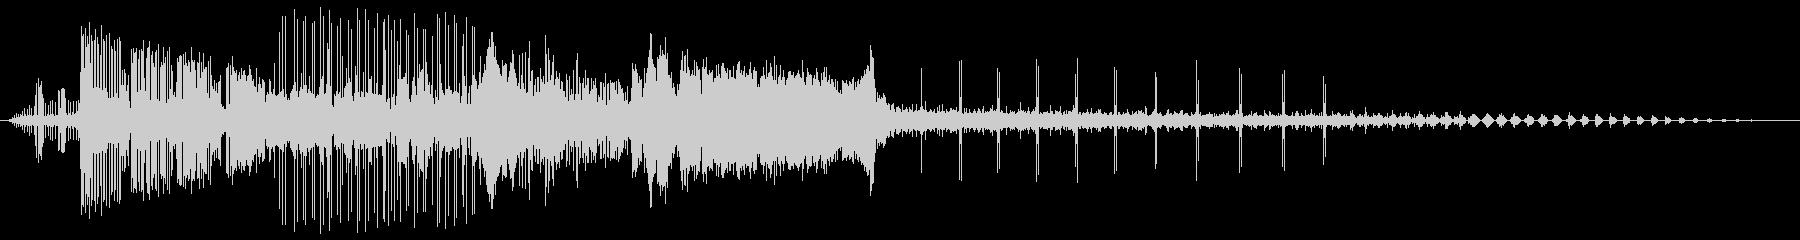 CINEMATIC BEEP 01の未再生の波形